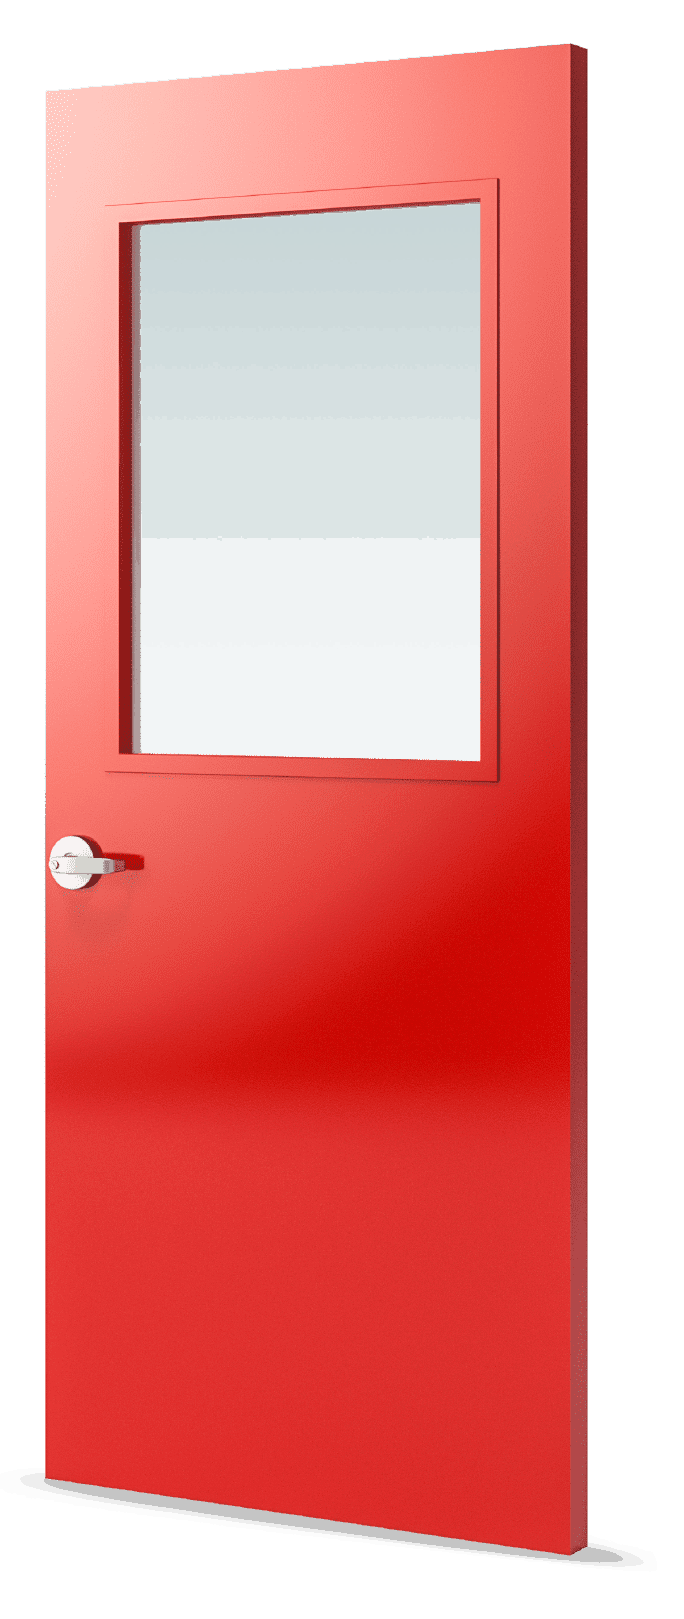 AF-100 Smooth Pultruded Fiberglass Door - Special-Lite